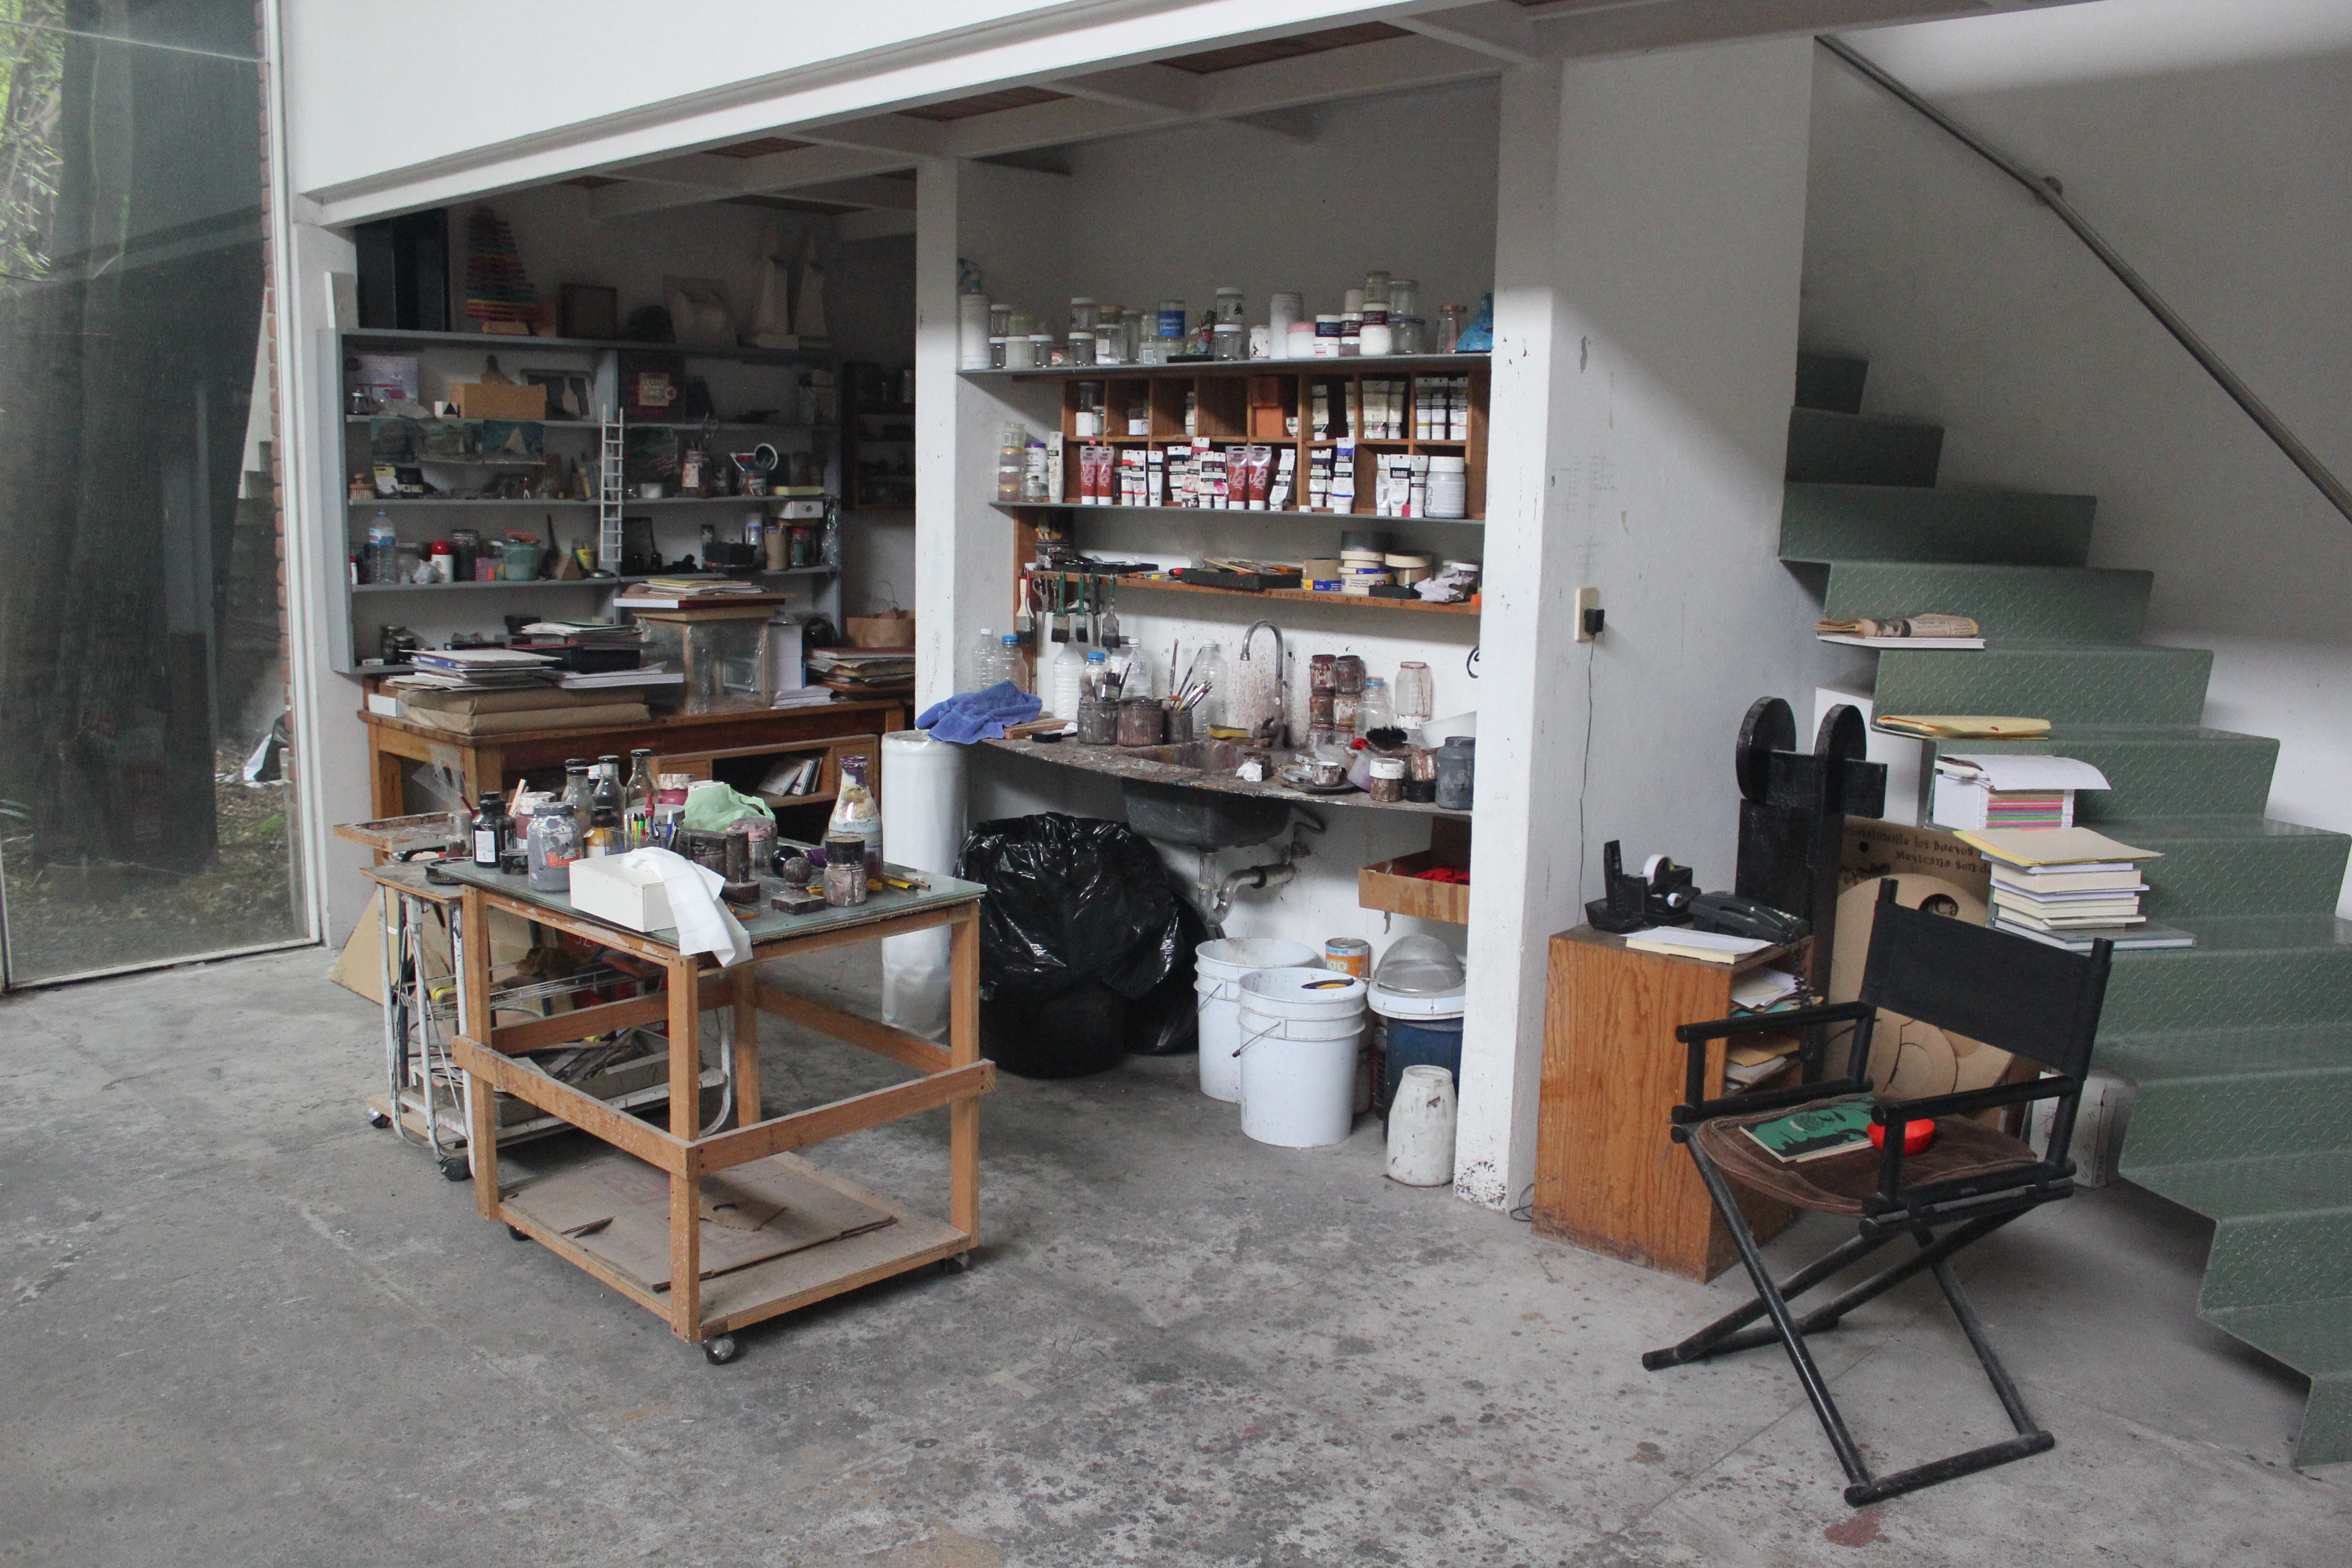 Perspectiva del taller de Vicente Rojo. Foto: Emilio Alvarez